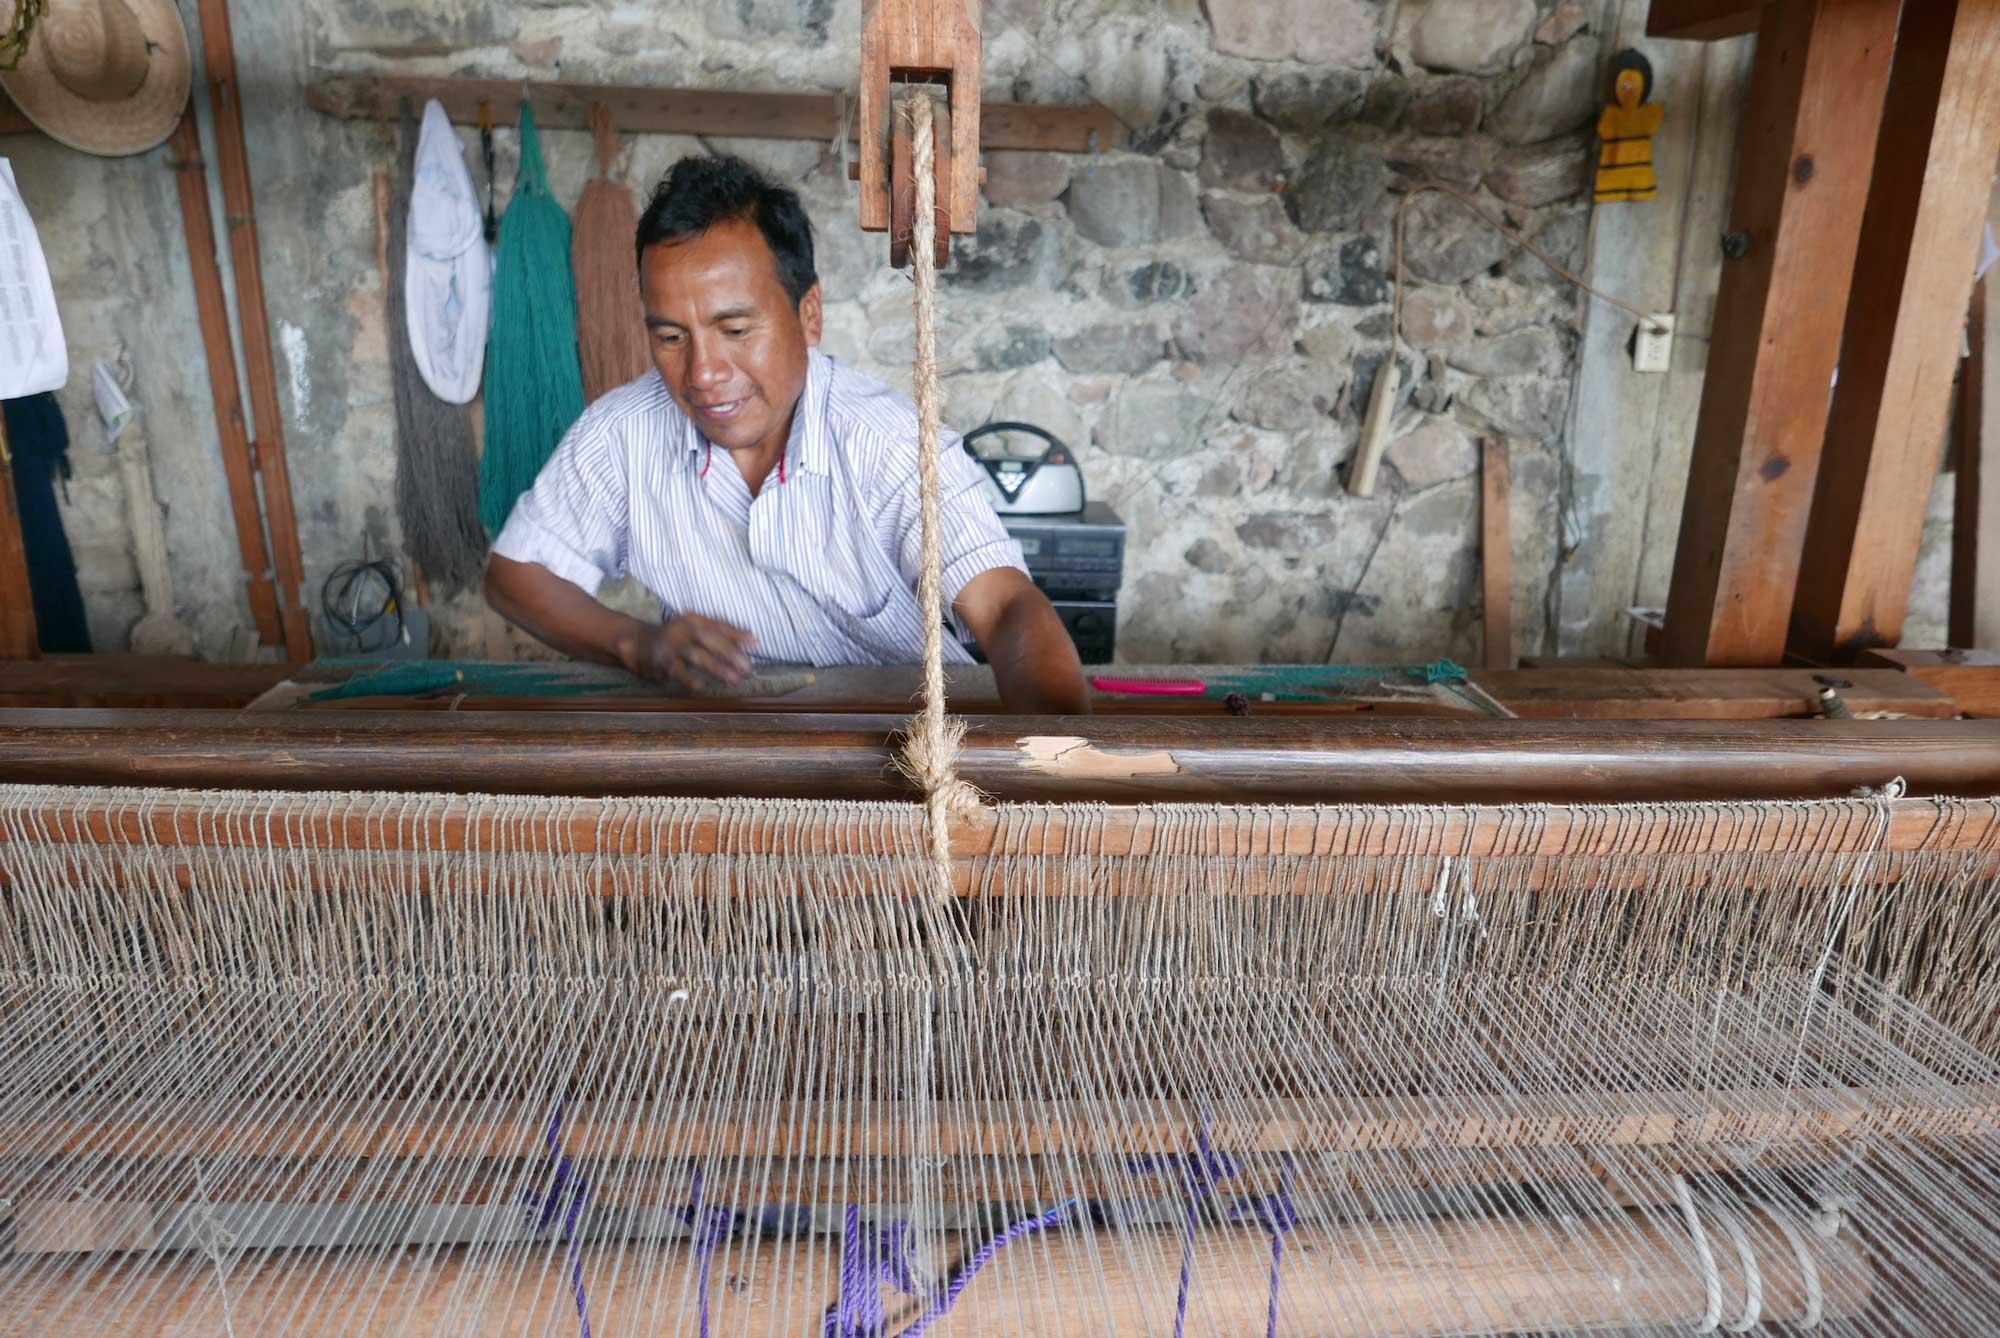 Artisan Weaving Mexican Wool Zapotec Rug Foot Pedal Loom Teotitlan de Valle Mexico